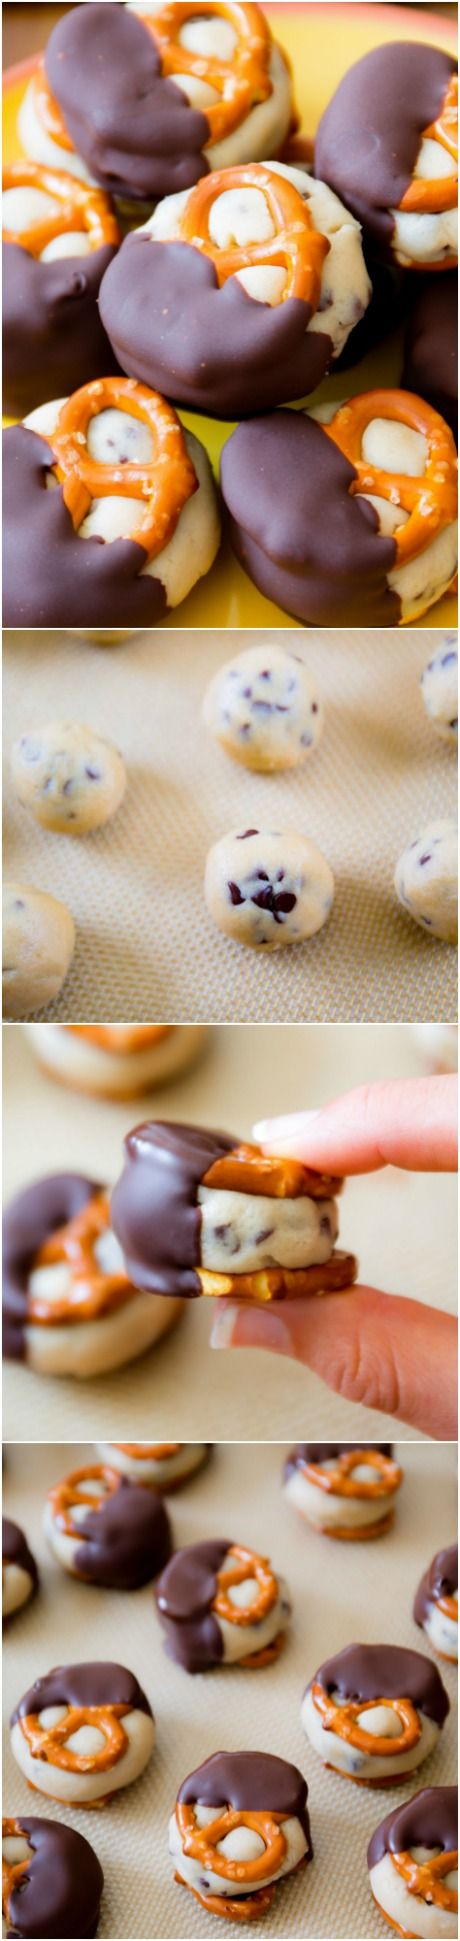 Cookie Dough Pretzel Bites. Addicting and so easy! Recipe found on sallysbakingaddiction.com